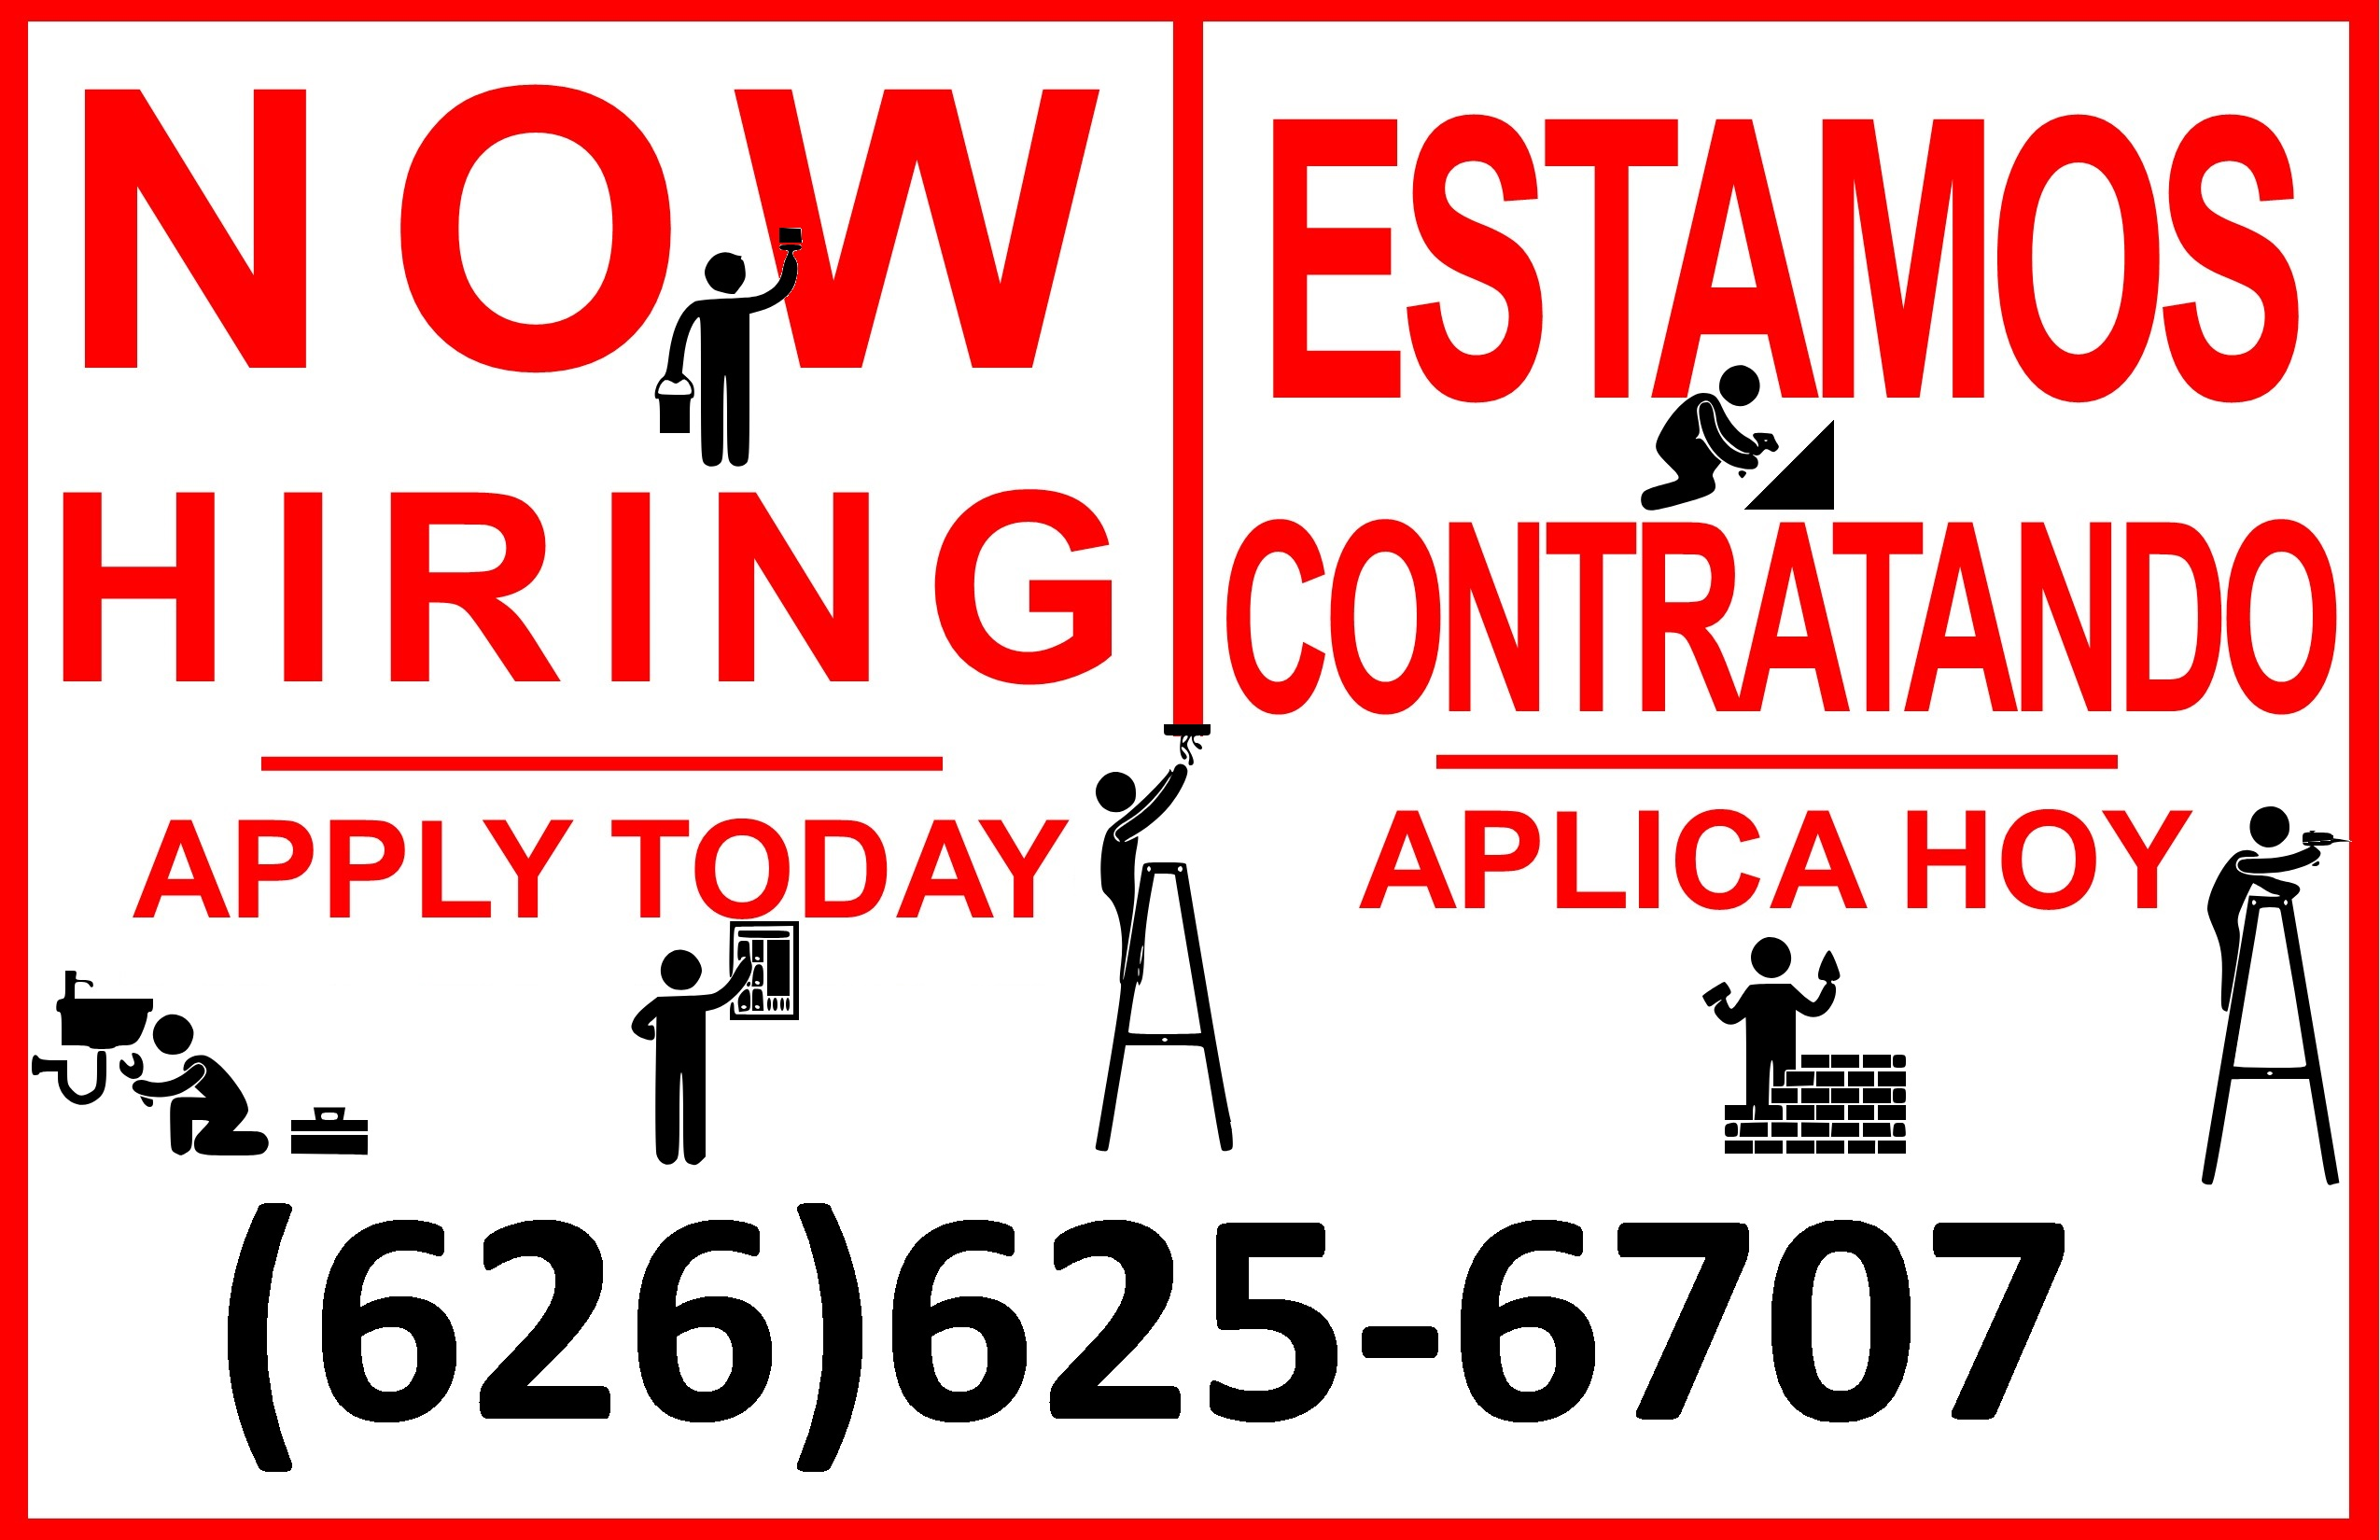 HIRING: Handyman